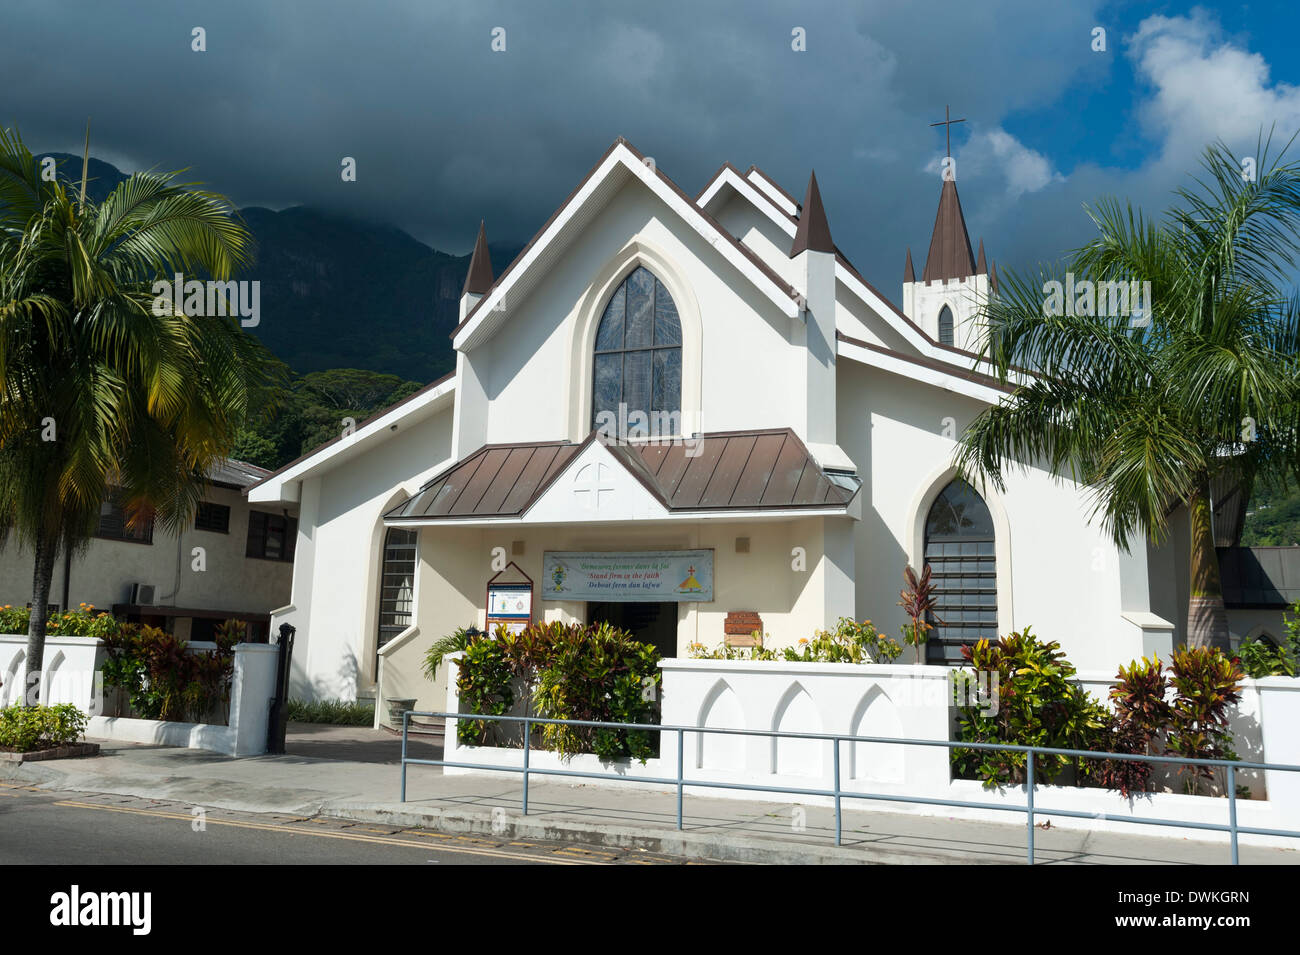 Victoria, Mahe, Seychelles, Indian Ocean, Africa - Stock Image